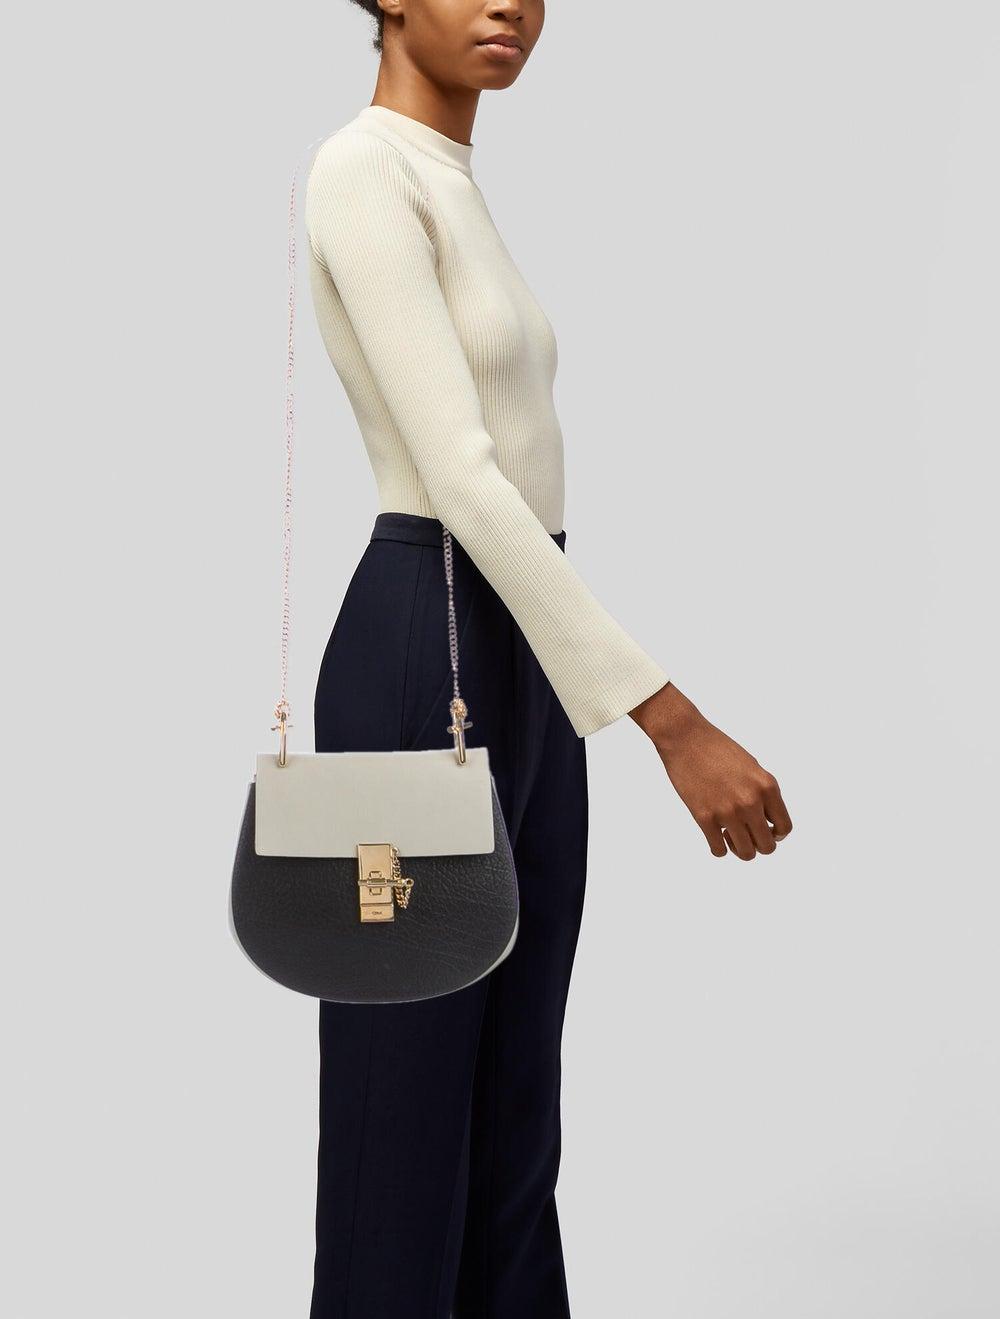 Chloé Leather Drew Crossbody Bag Black - image 2